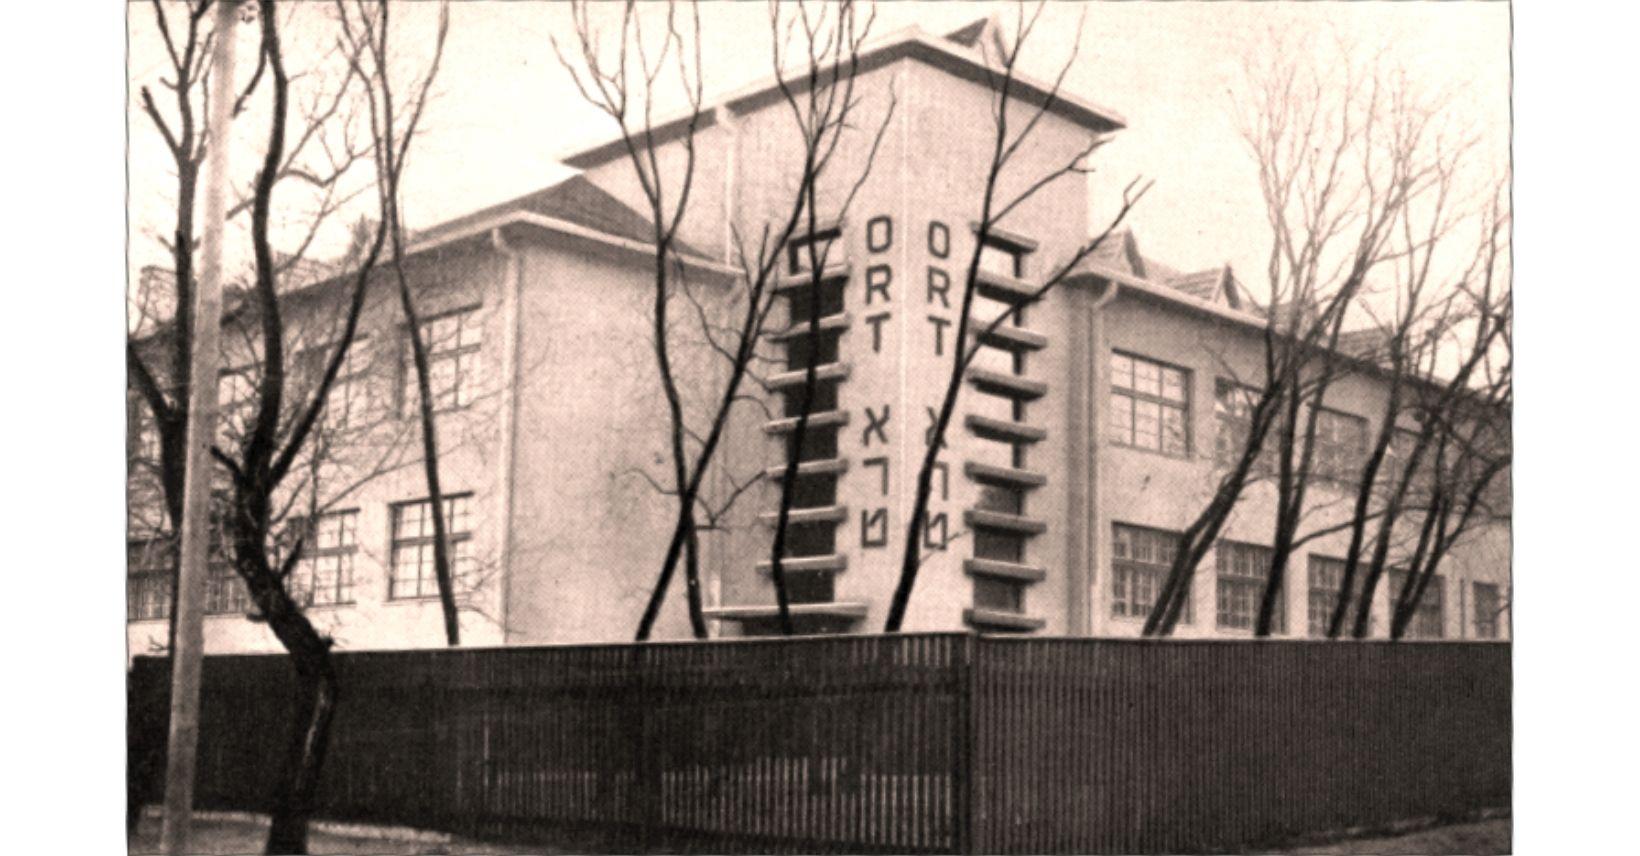 zydu amatu mokykla ort istorine